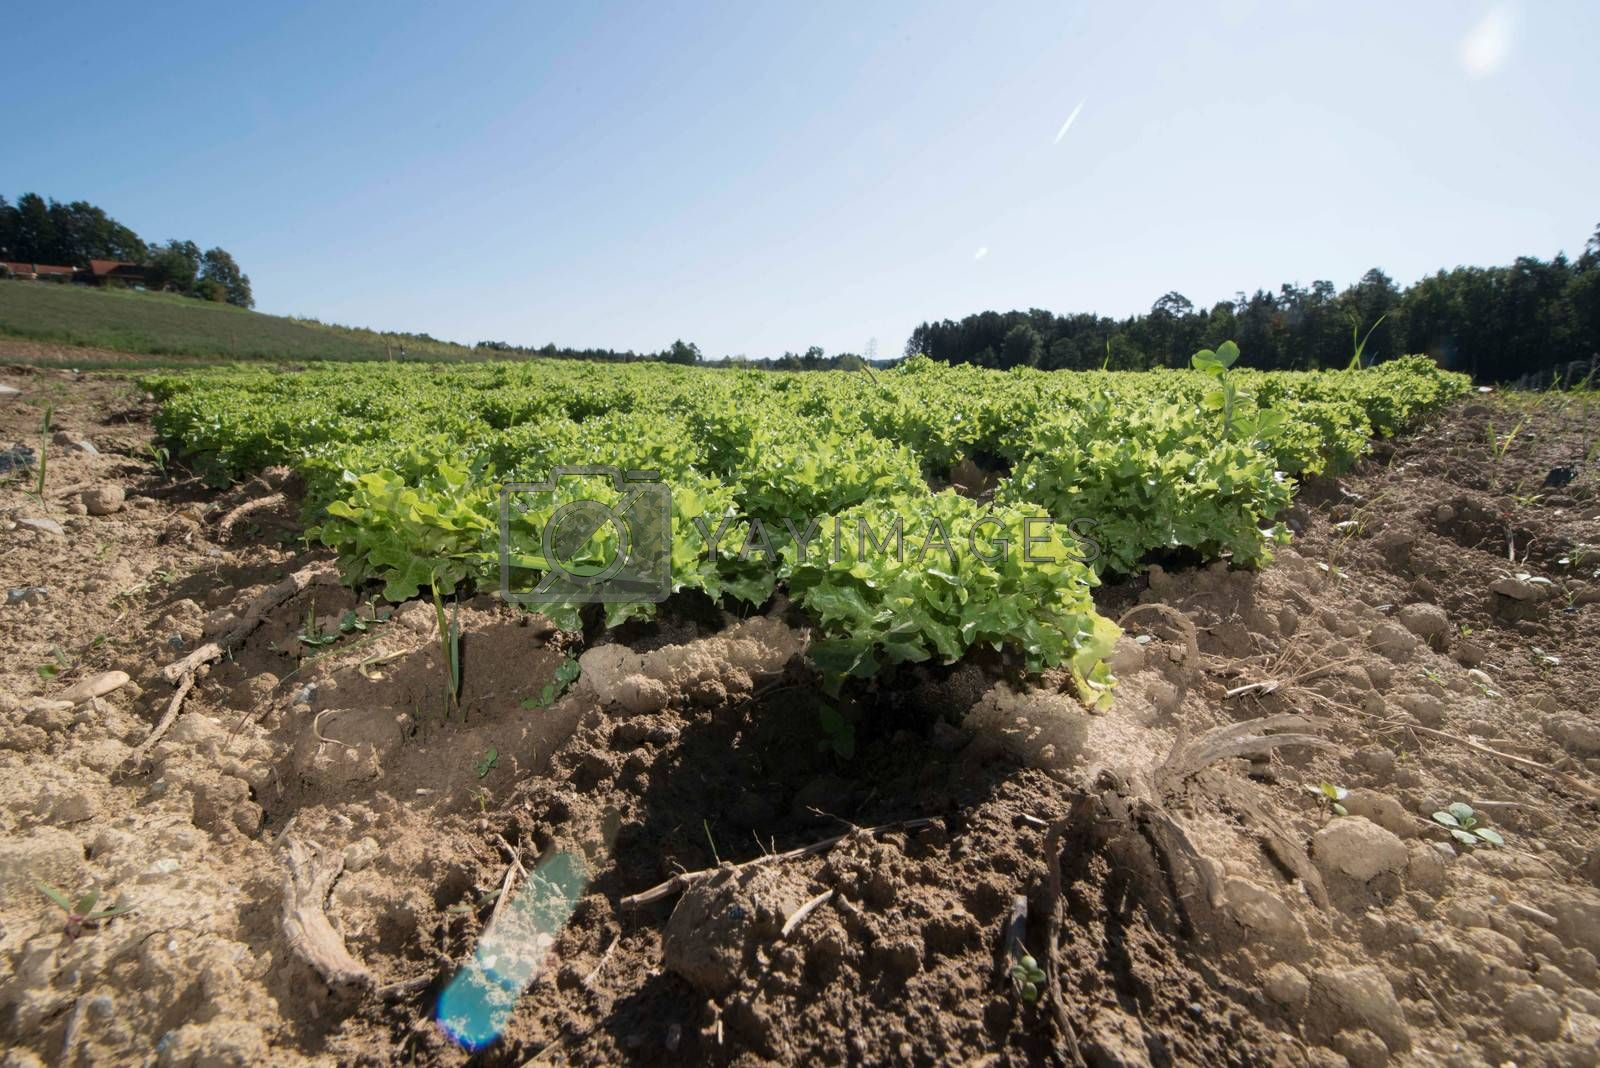 fresh green lettuce growing on the field, salad in the soil